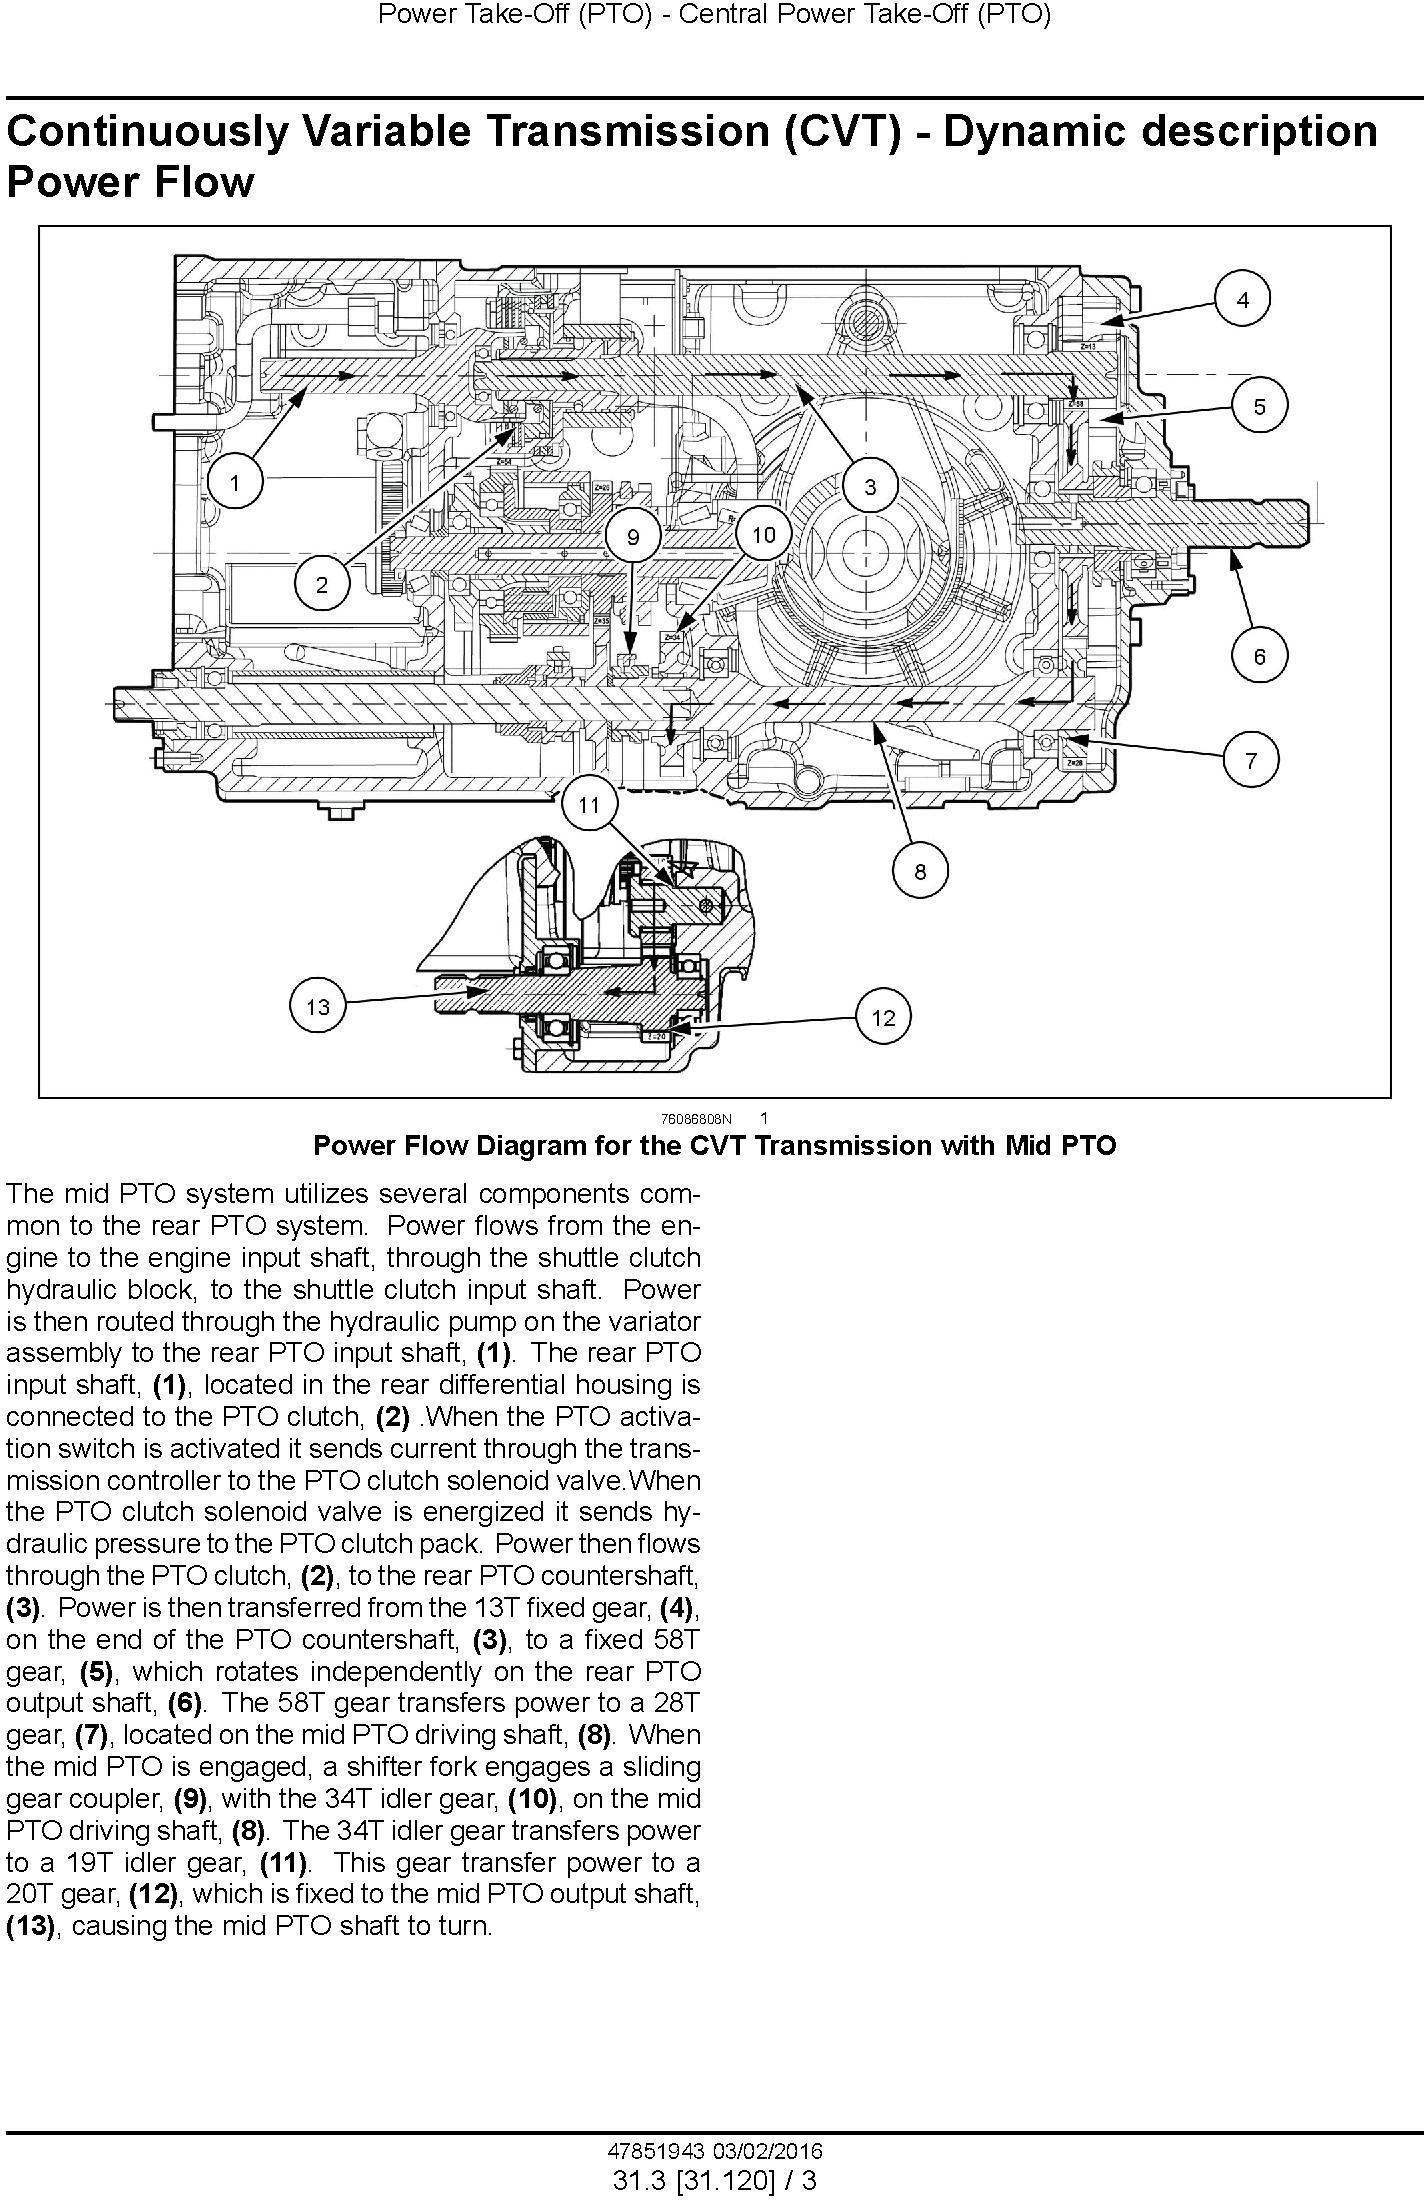 New Holland Boomer 46D CVT, 54D CVT Tier 4B (final) Compact Tractor Complete Service Manual (USA) - 3